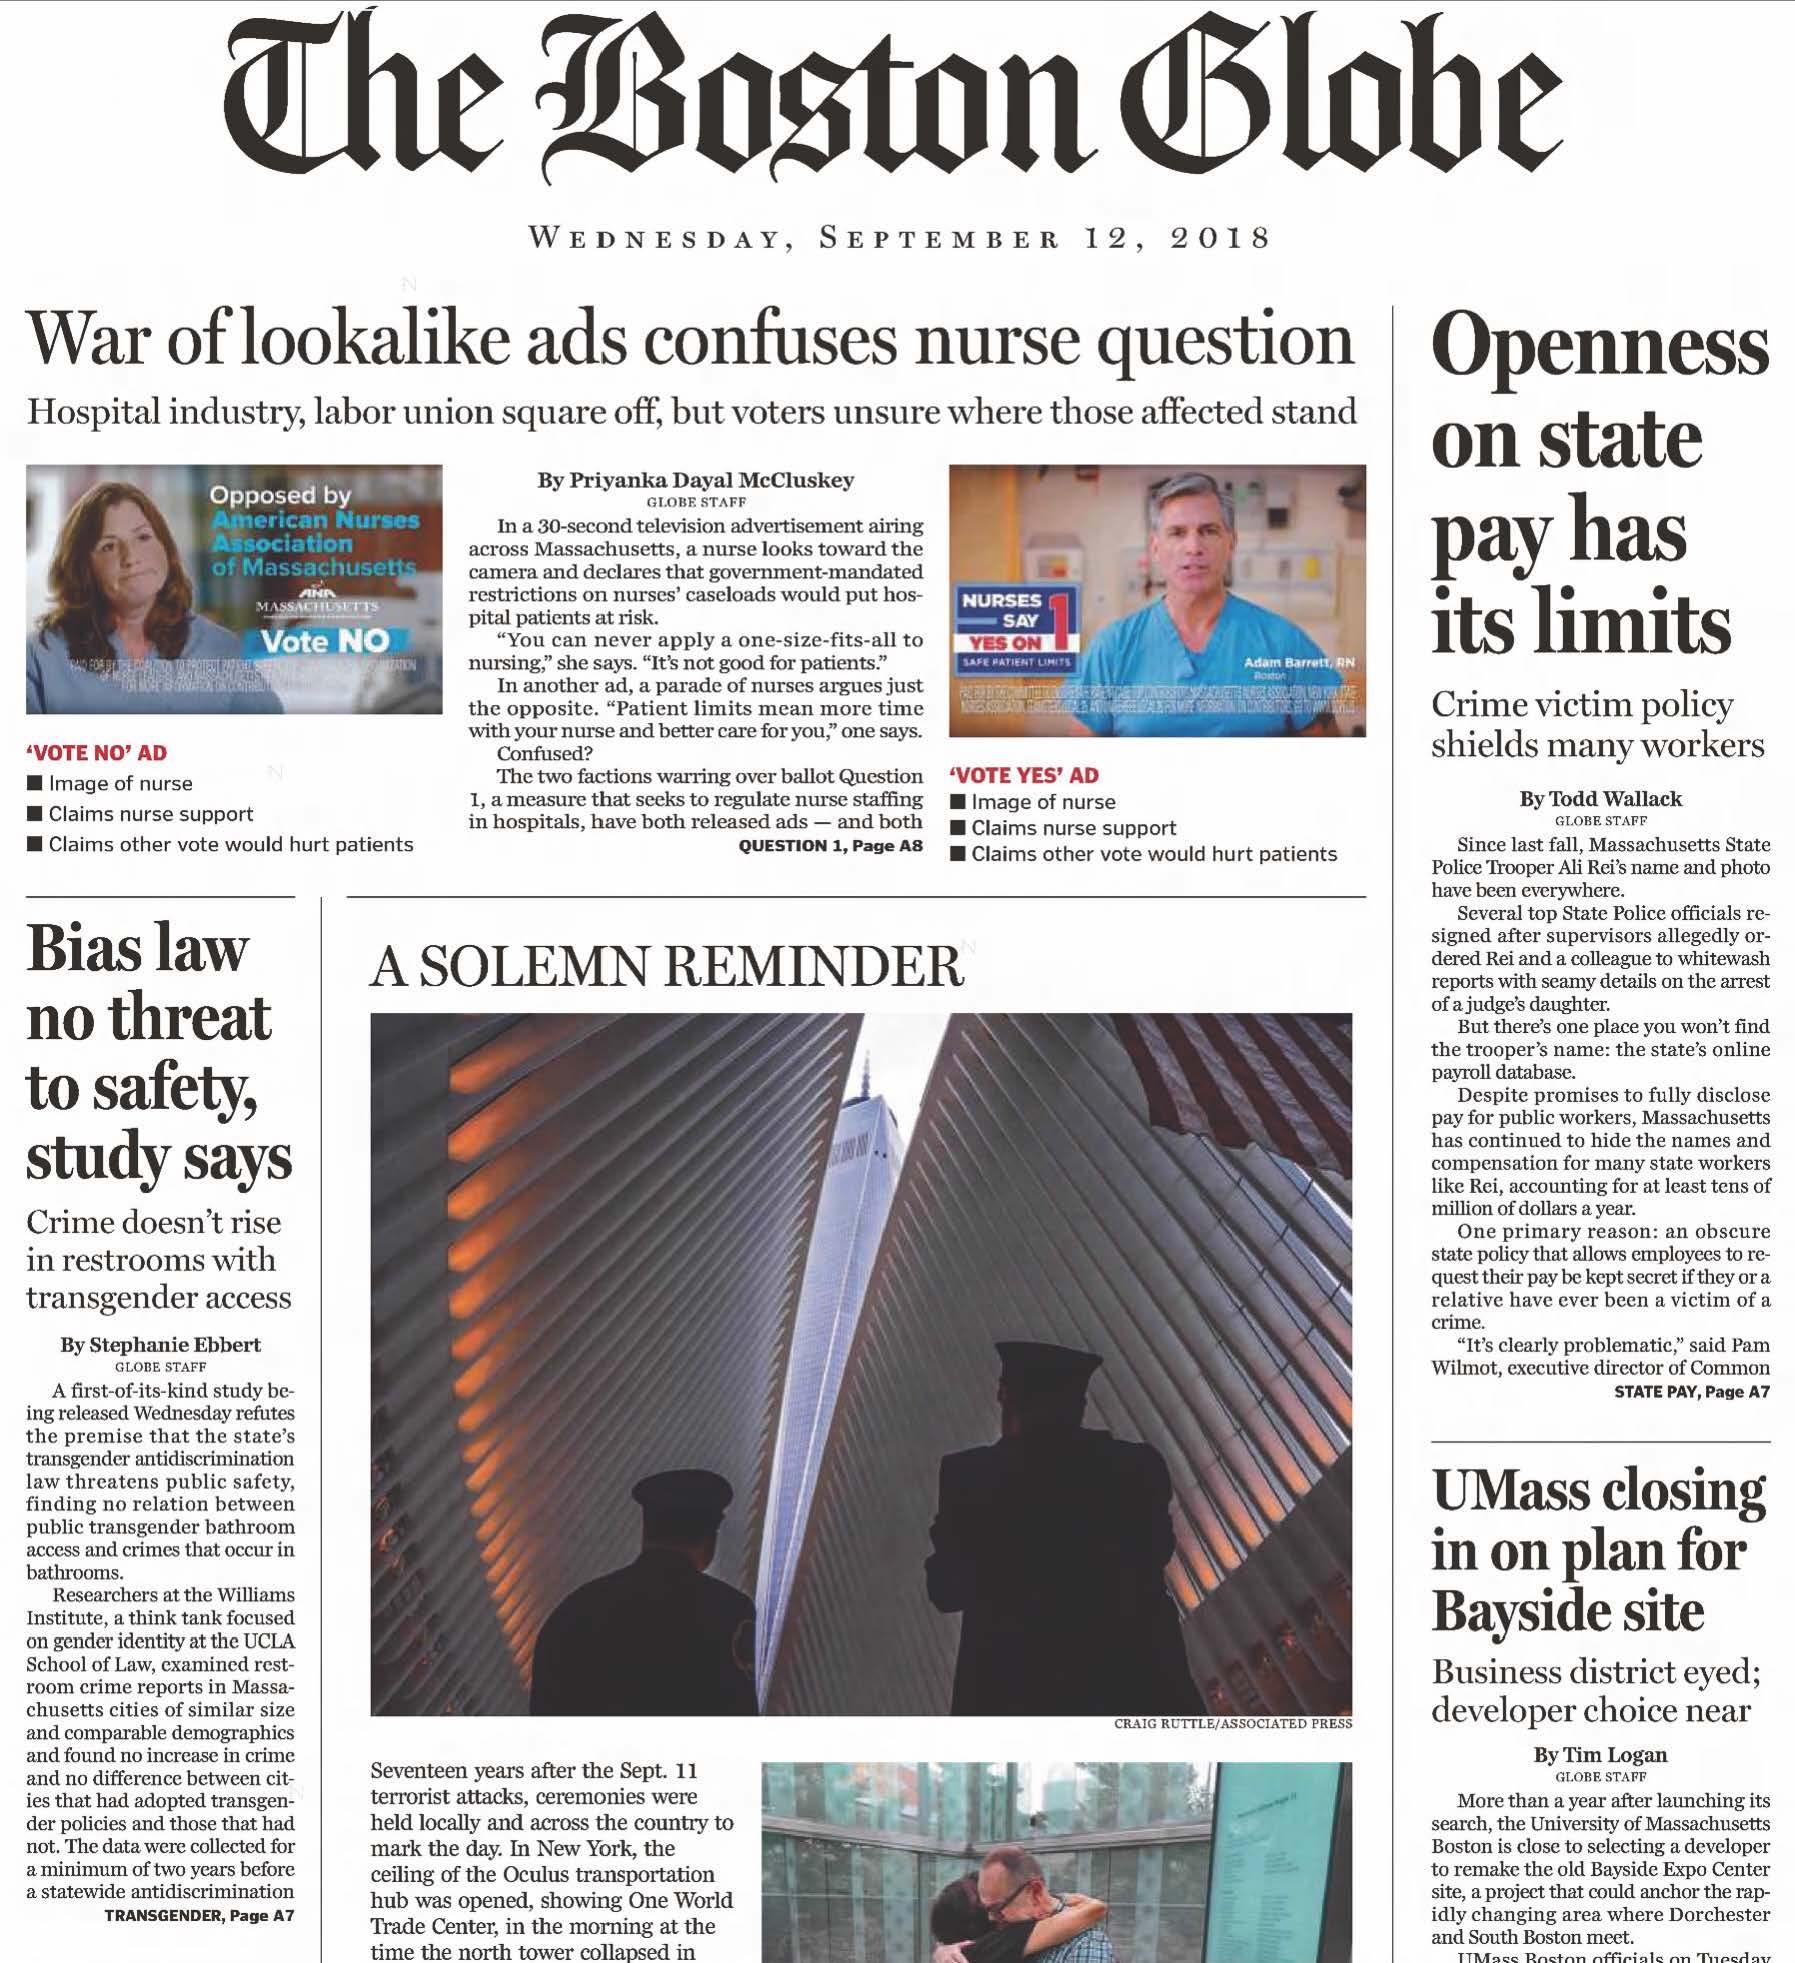 Boston Globe Front Page 9.12.18.jpg